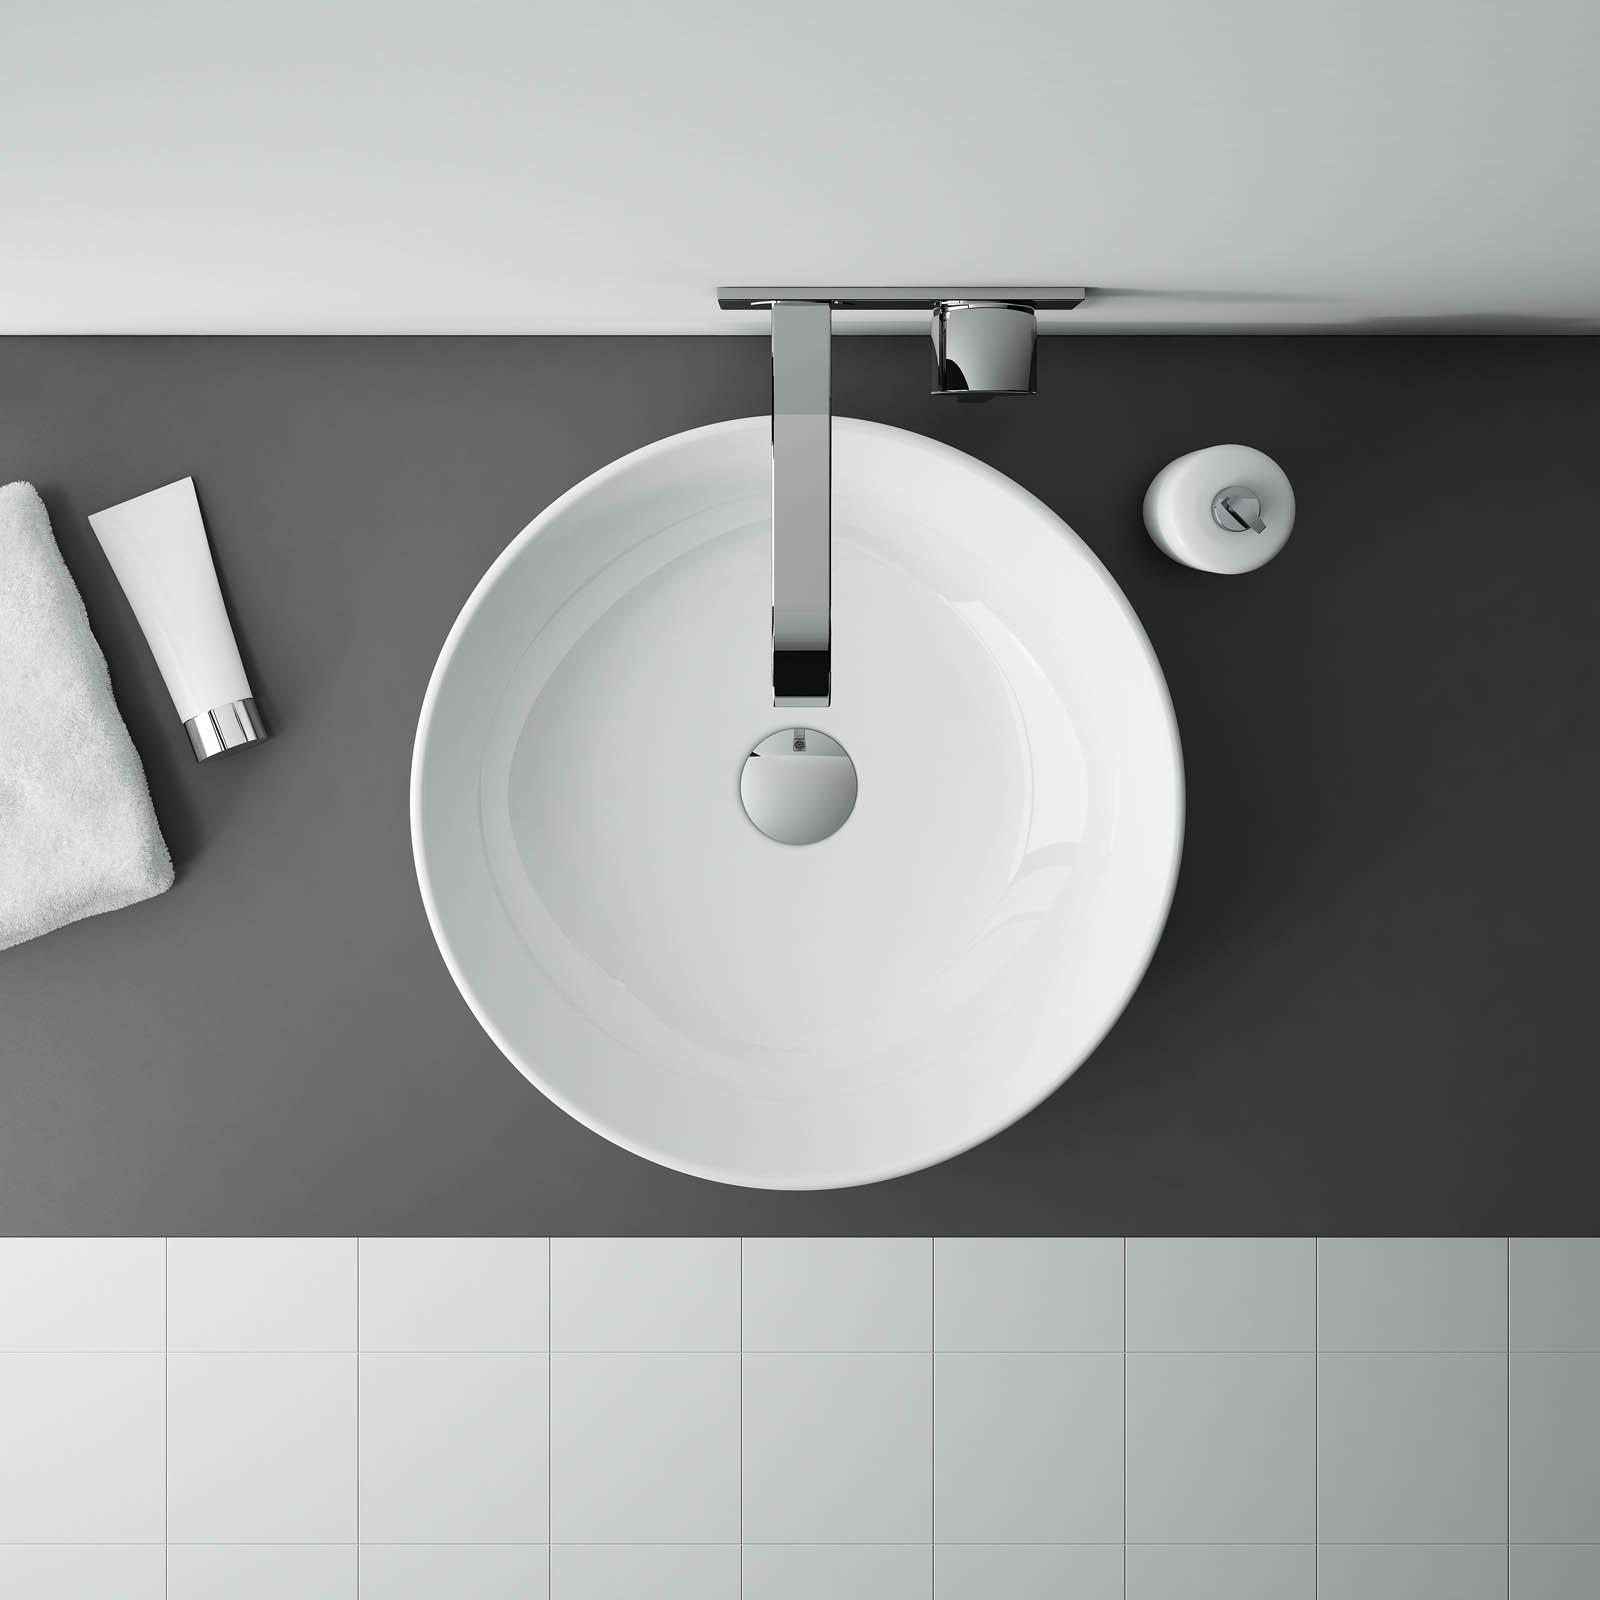 Umývadlo na dosku LIMONA 41,5 x 41,5 cm | LOTOSAN Kúpeľne a Interiér